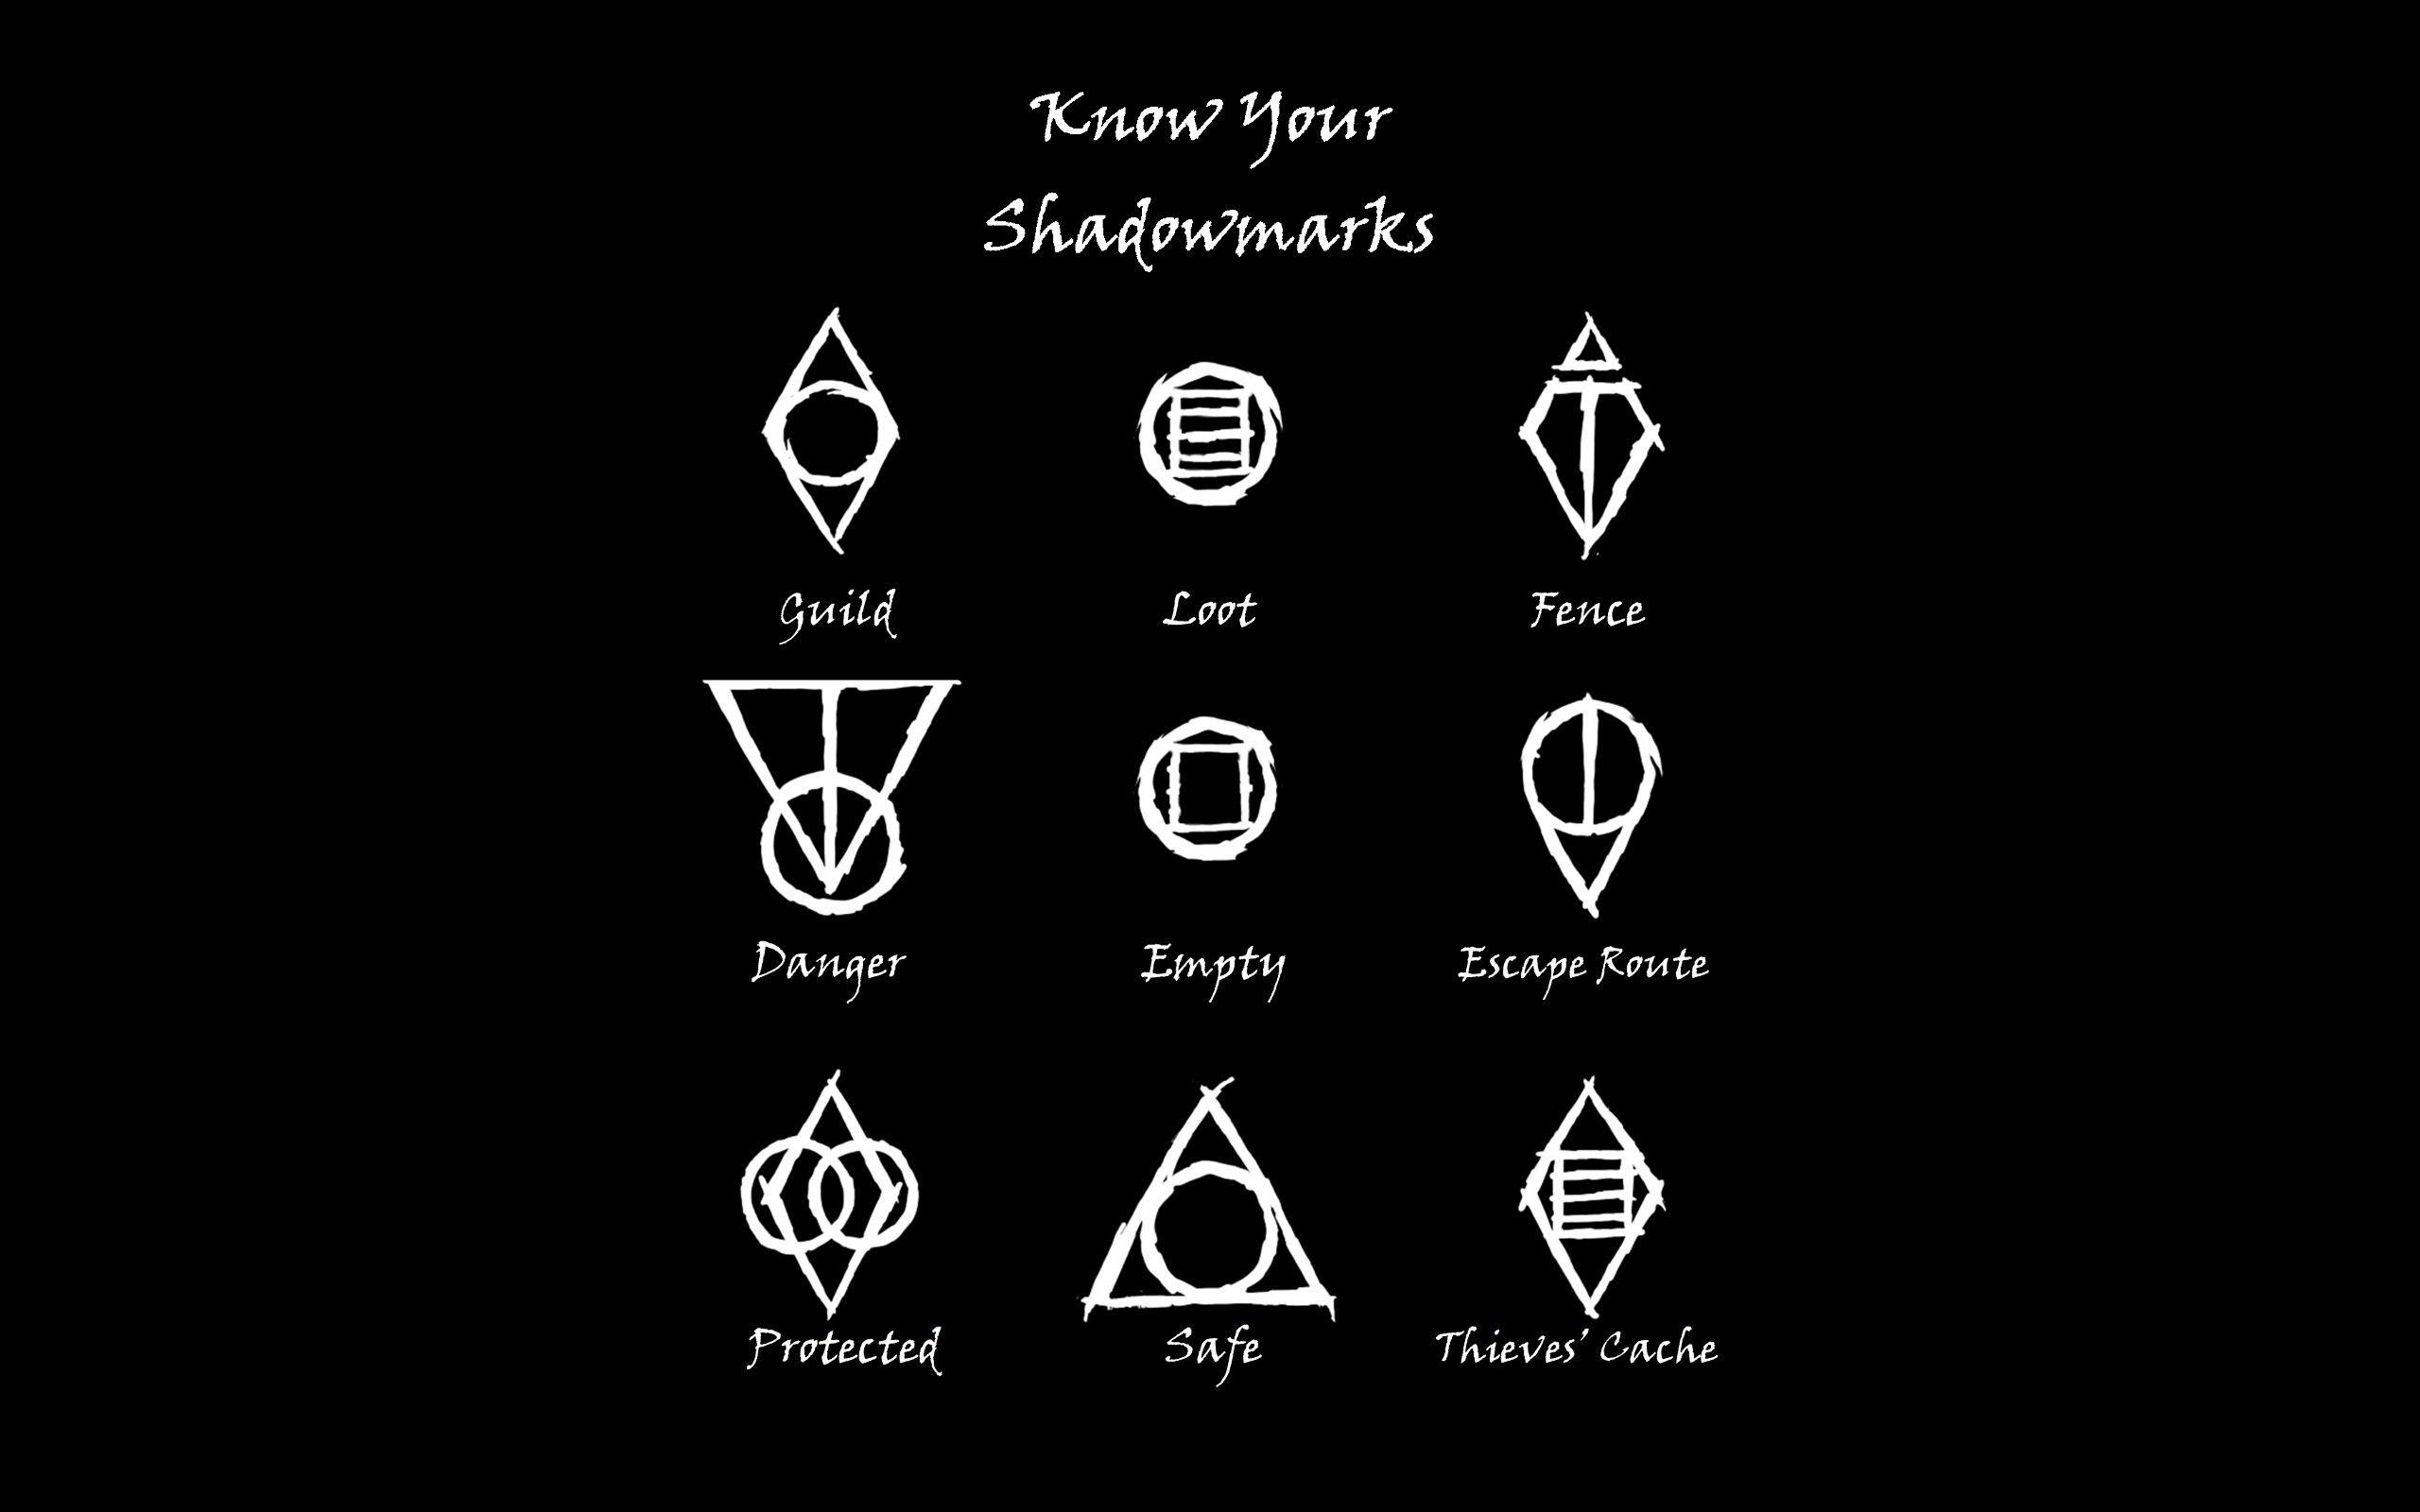 General 2560x1600 The Elder Scrolls V Skyrim Black Symbols Thieves